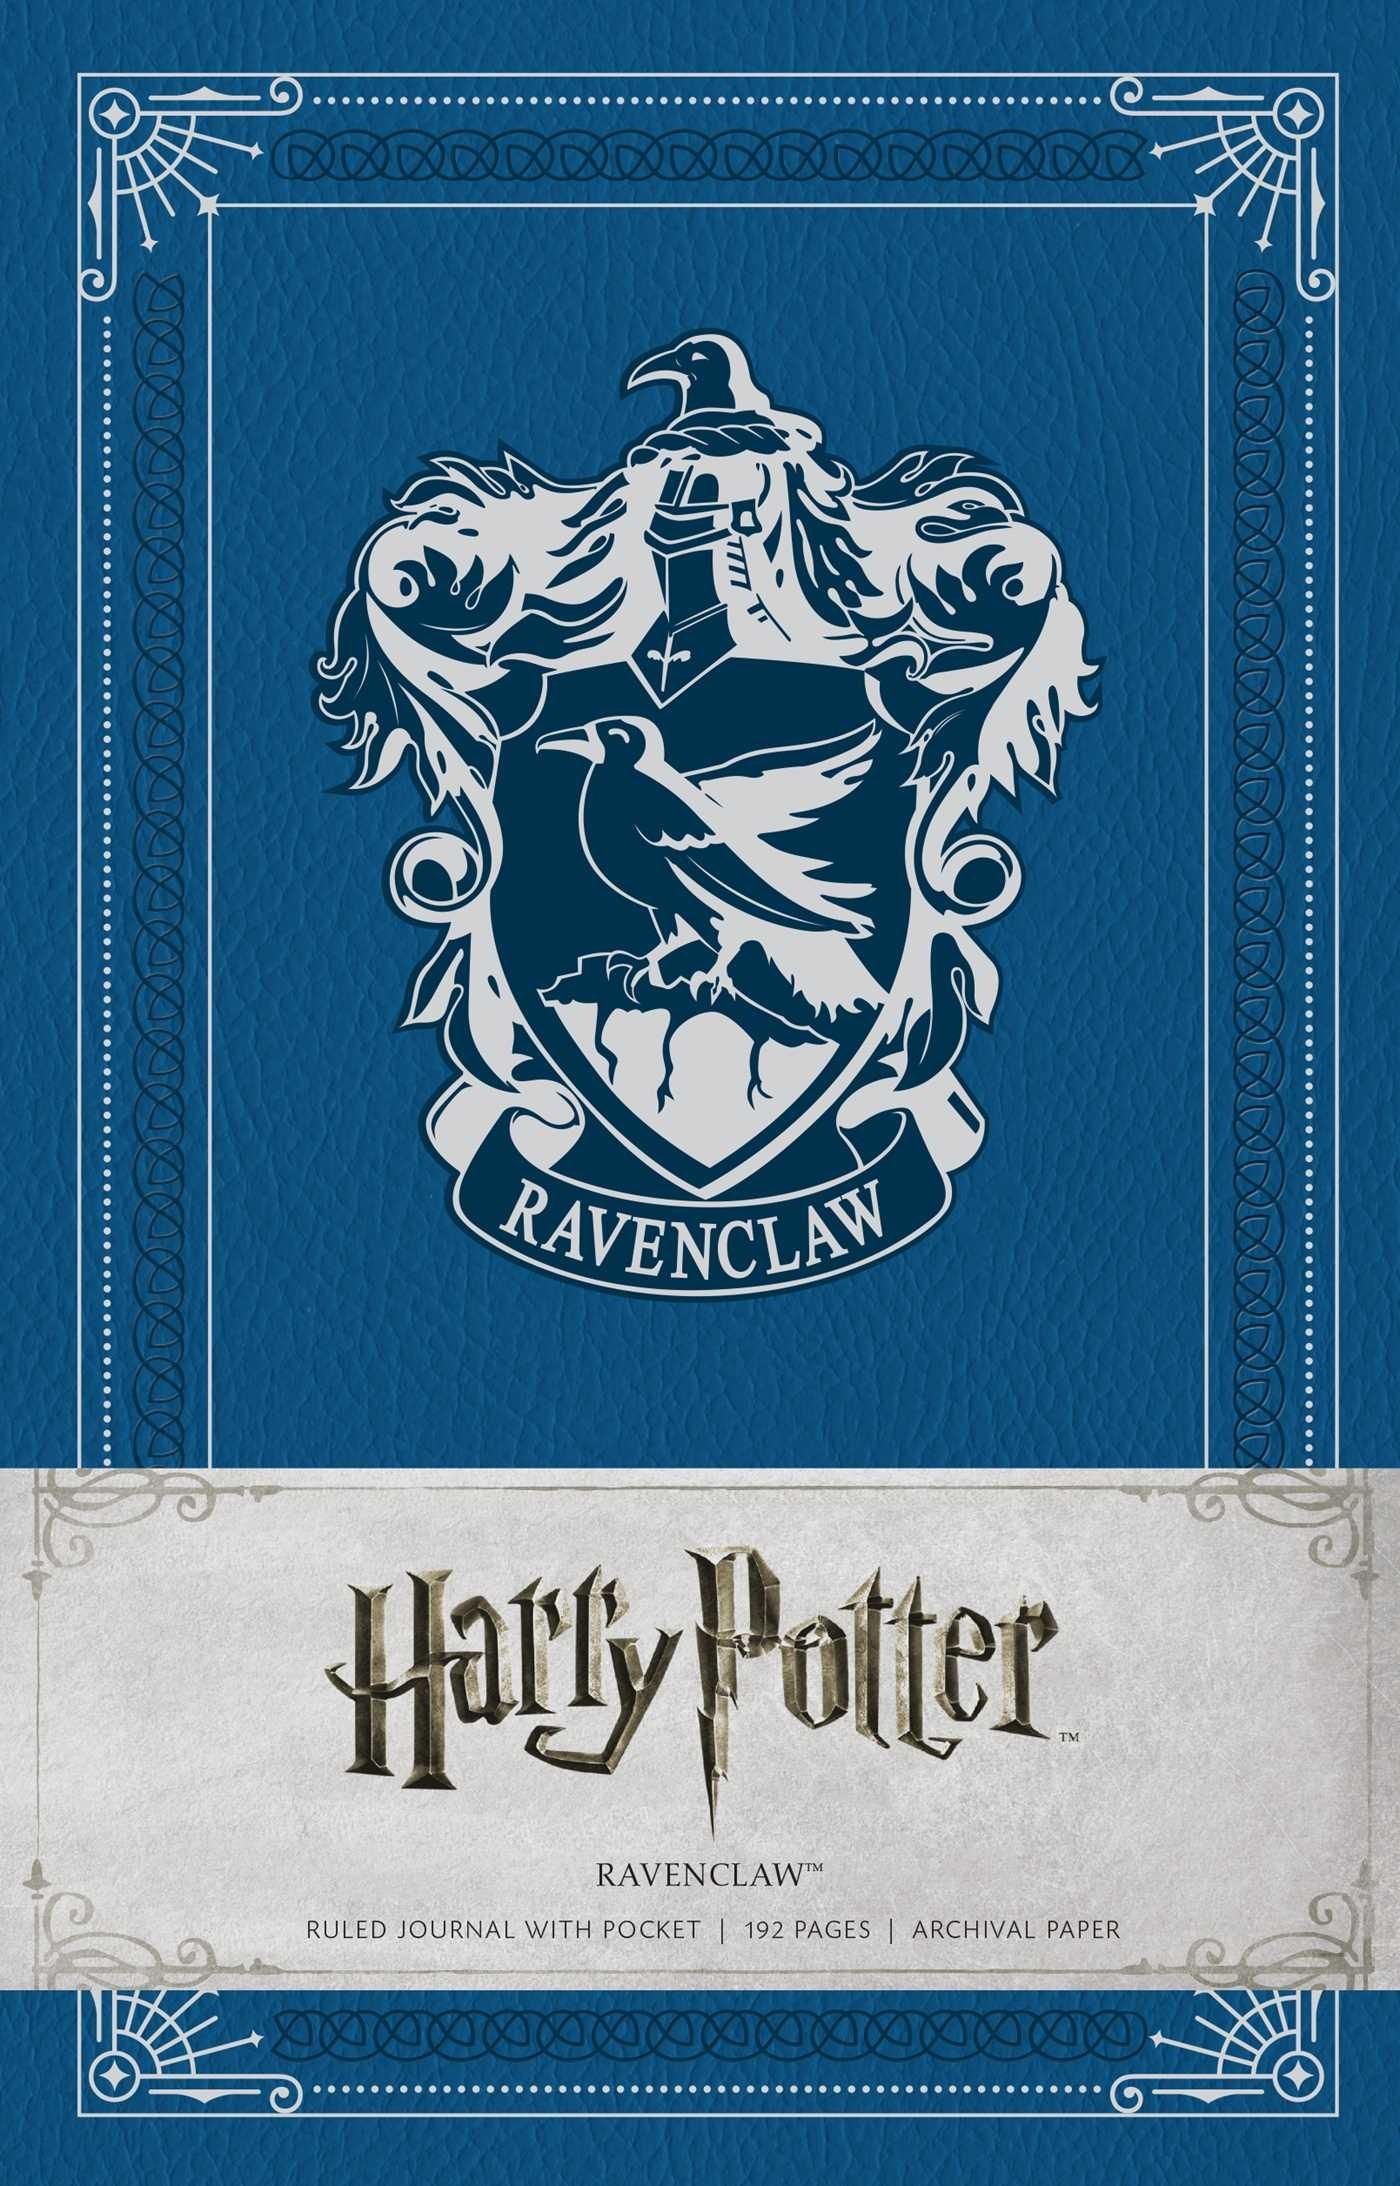 Harry potter ravenclaw hardcover ruled journal 9781608879496 hr …